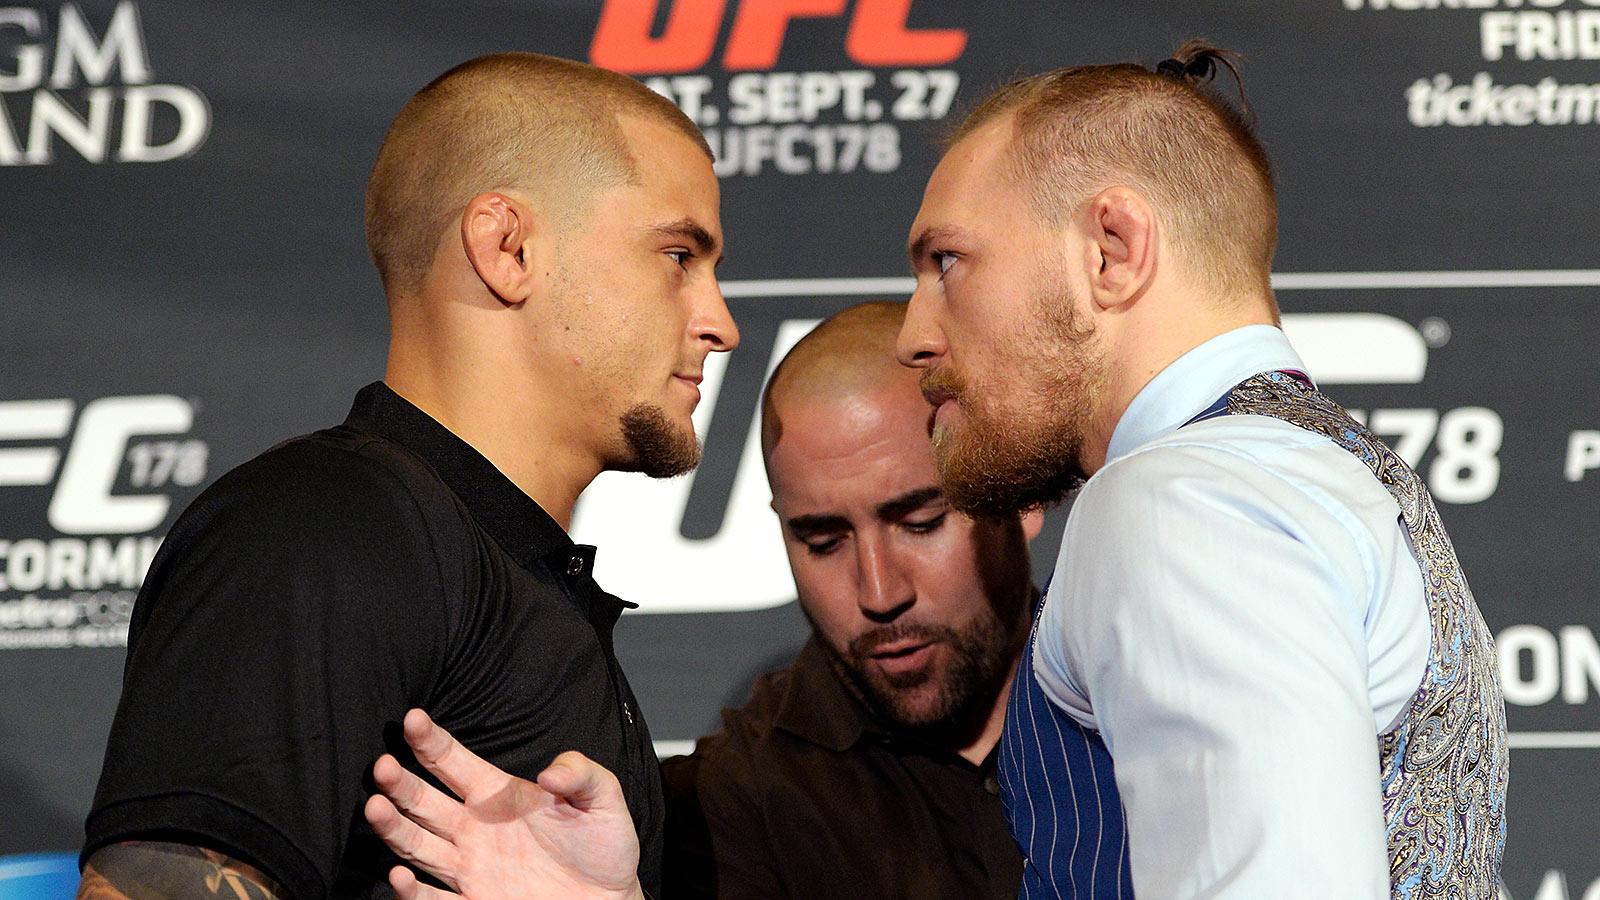 Dustin Poirier calls out Conor McGregor in MMA or boxing - and the Irishman responds! - Poirier